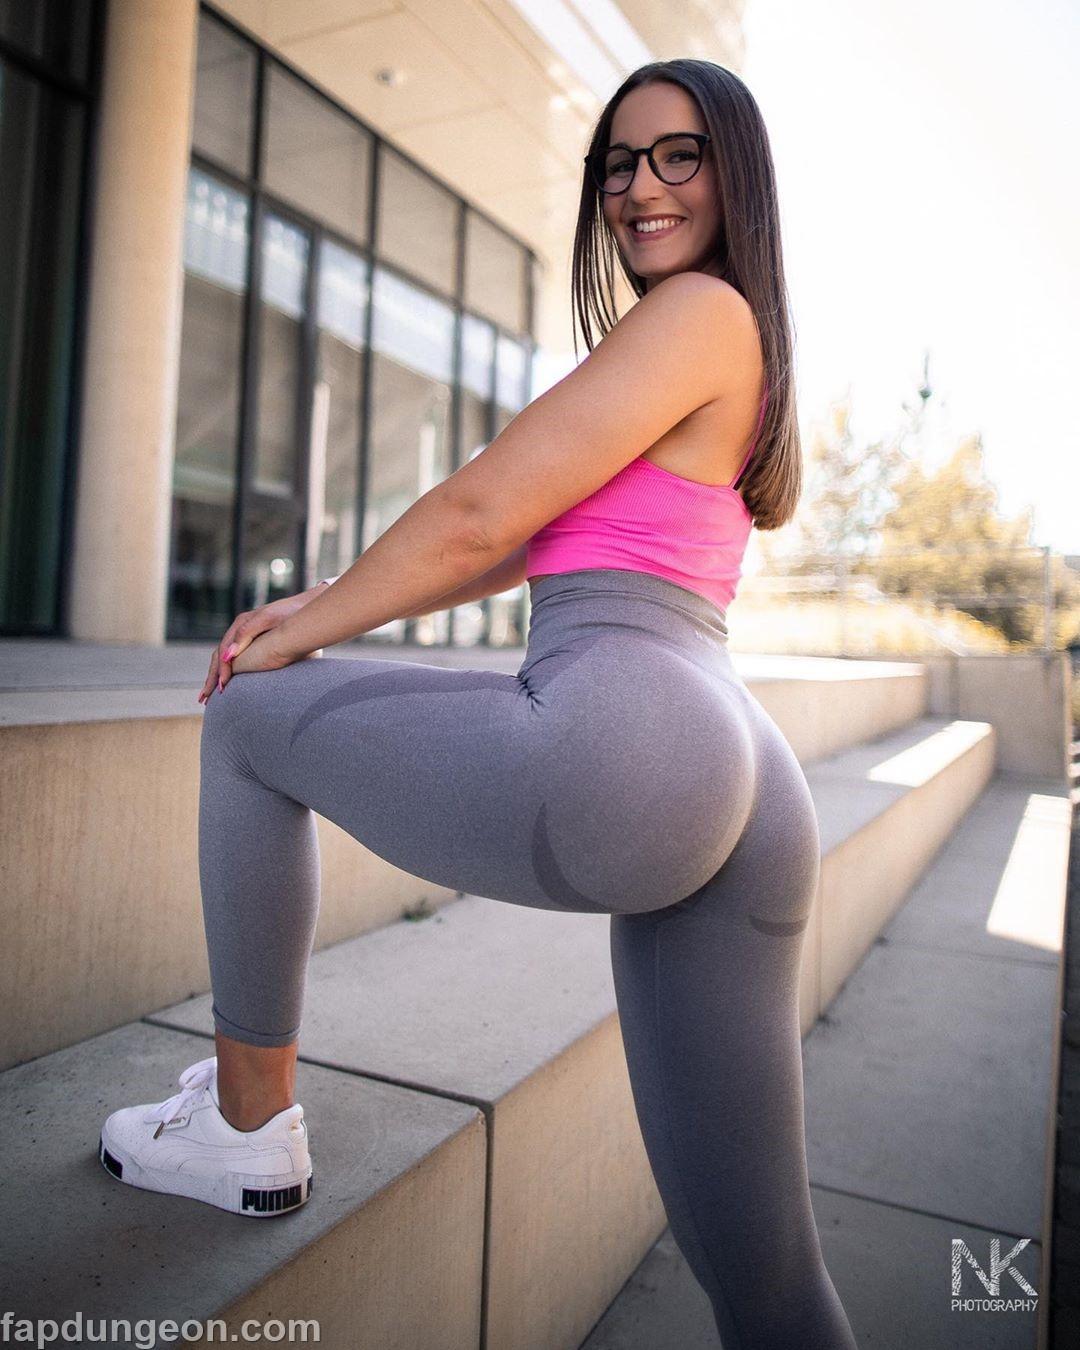 Laramarieconrads Tits